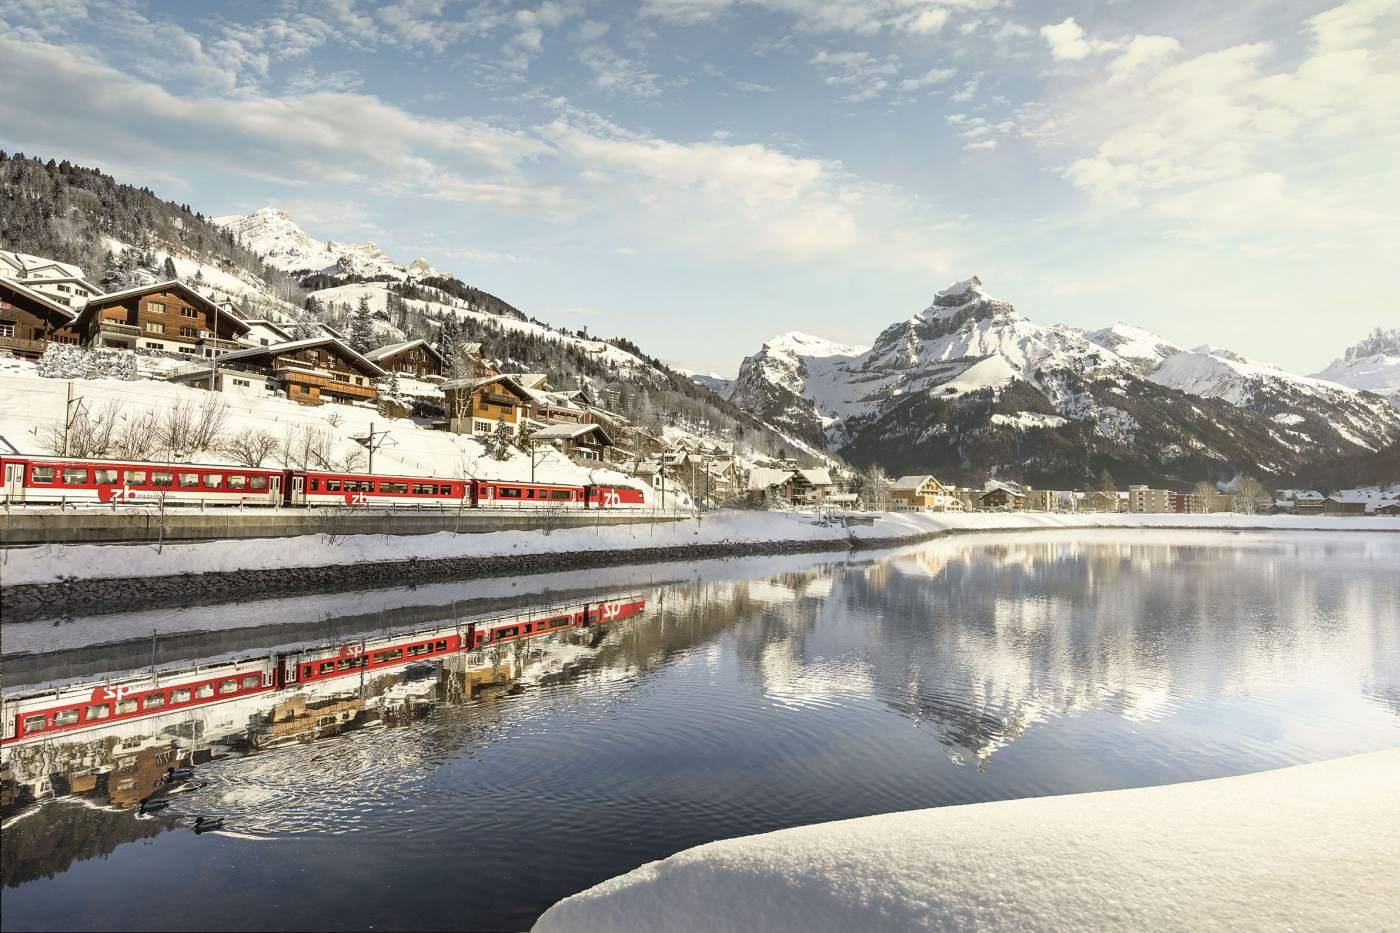 Luzern-Engelberg Express in Engelberg